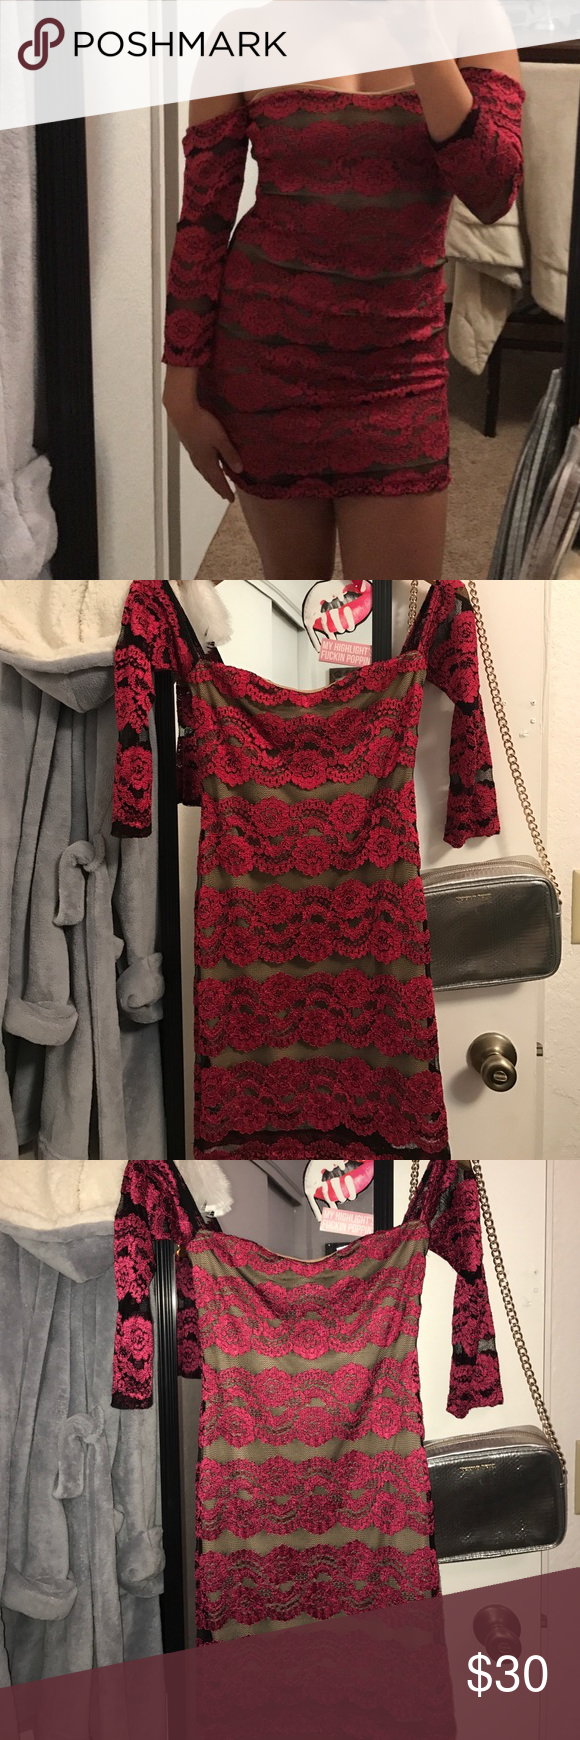 Very pretty lace dress off the shoulders Lace print. Dresses Mini